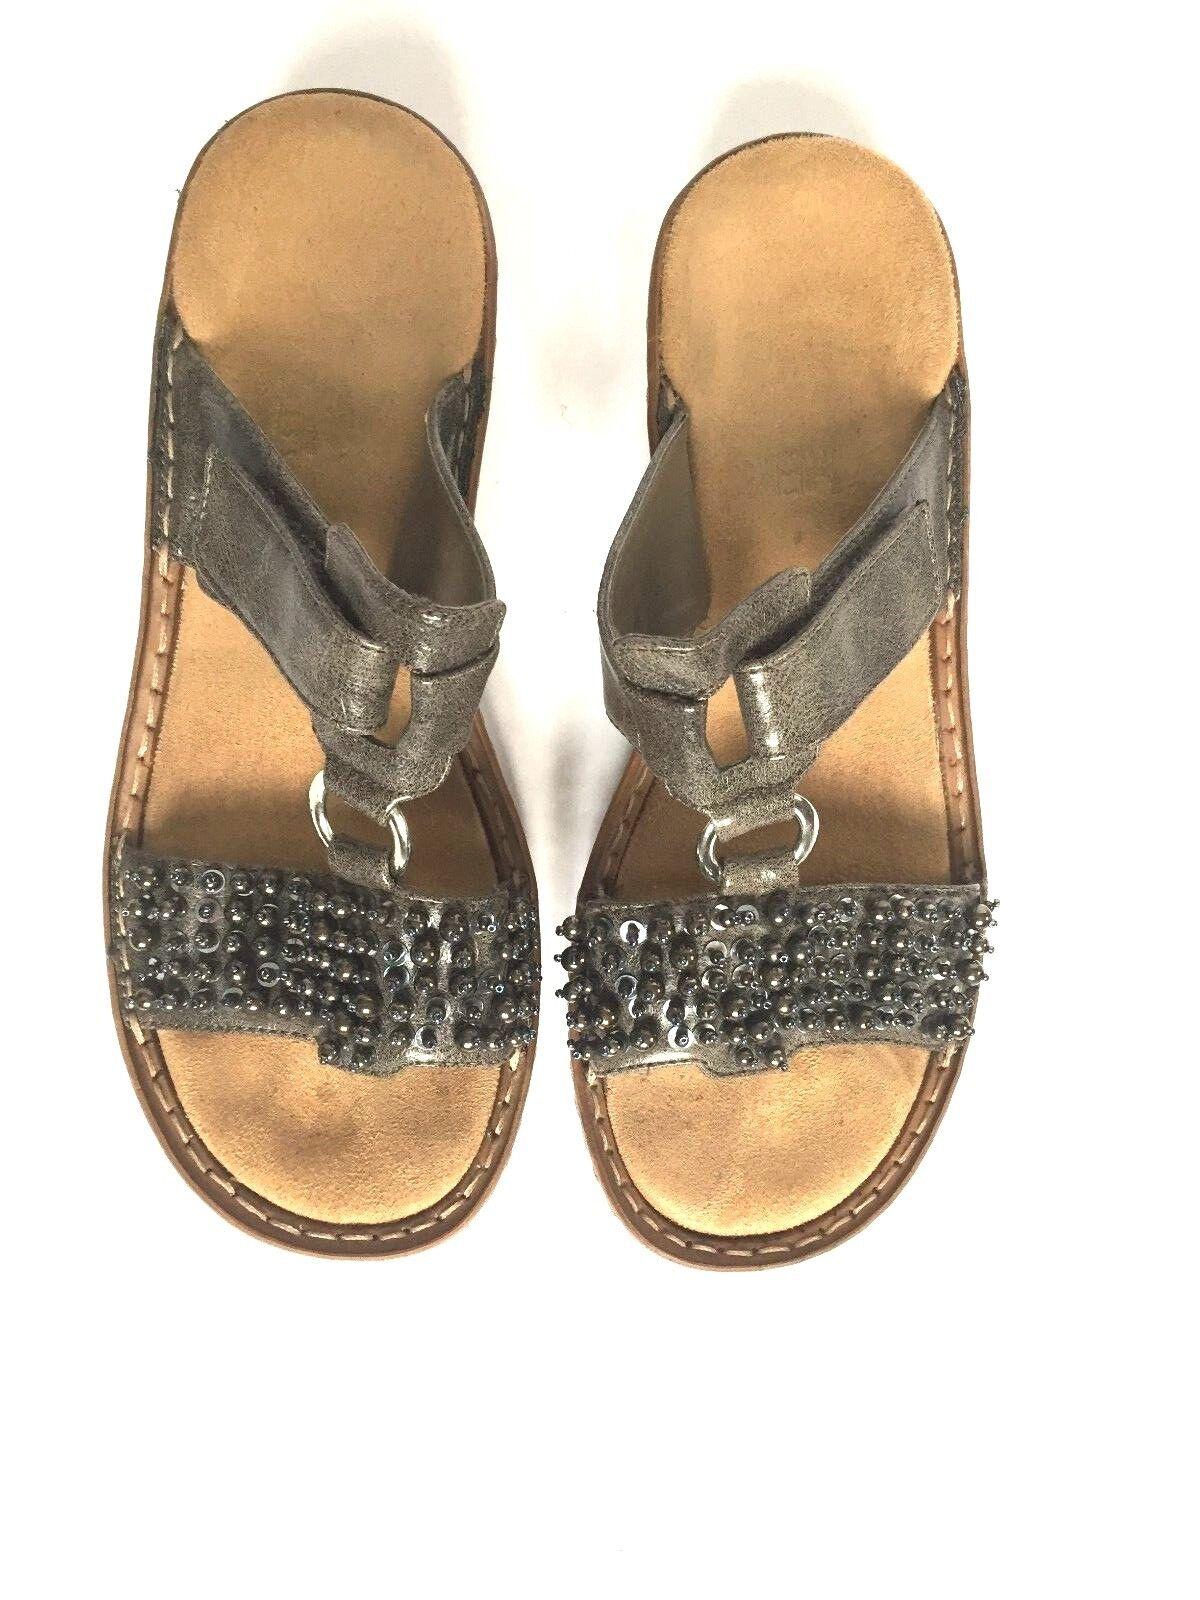 RIEKER Sandals Slip-on shoes Silver Sparkle Women's size 37 (US 7) Slight Wedge